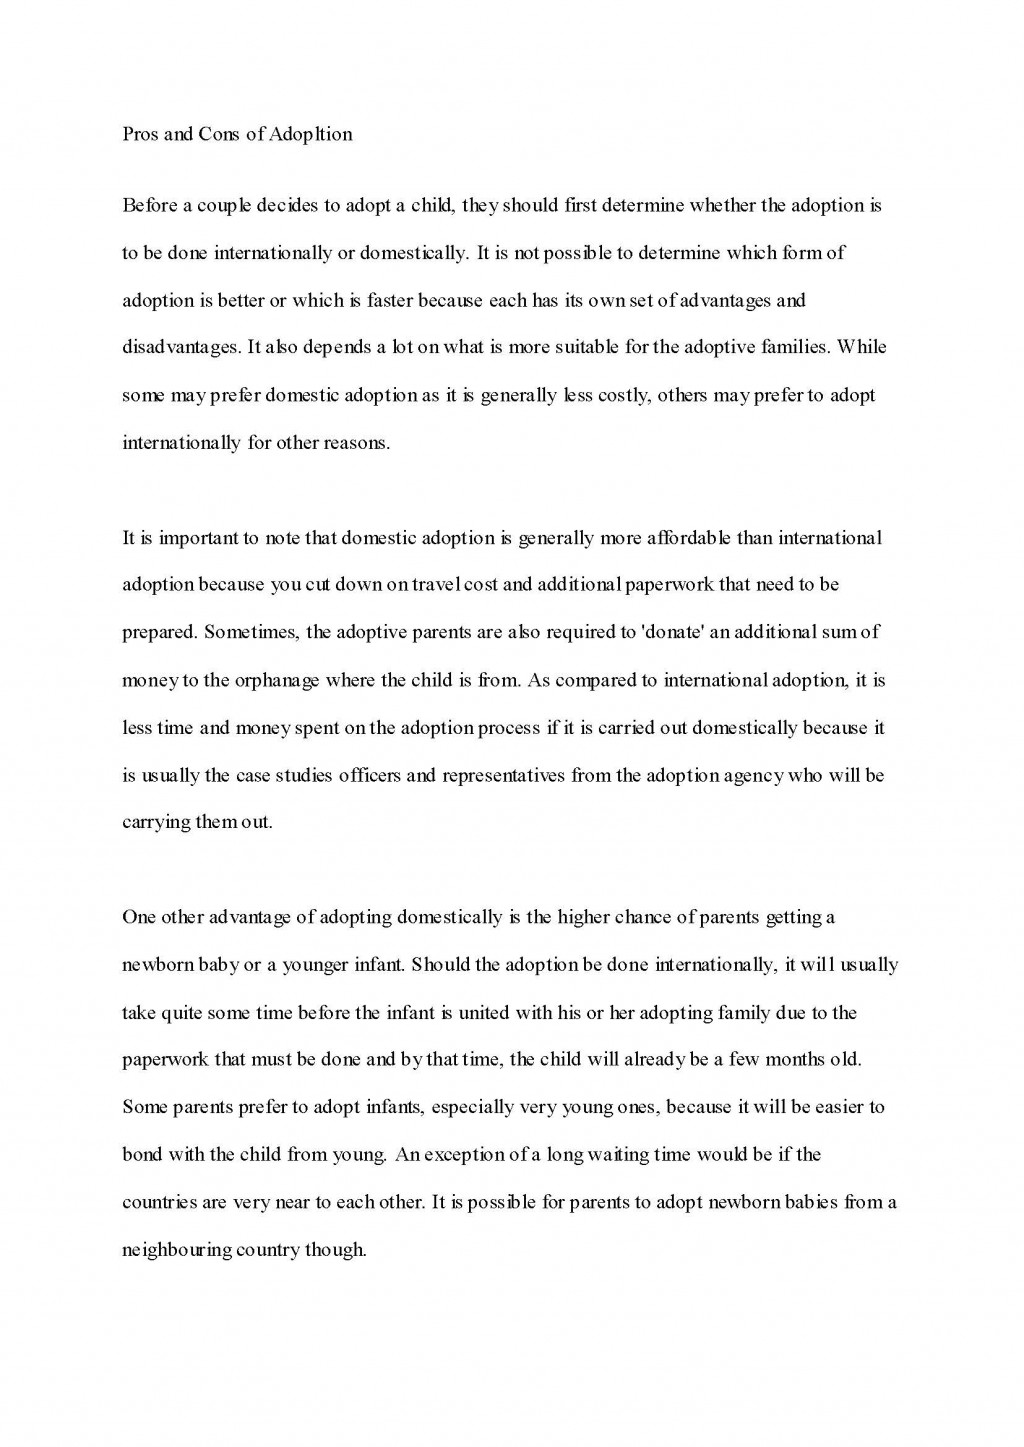 022 Essay Example Scholarship Prompts Adoption Magnificent Robertson 2018-19 Vanderbilt Washington And Lee Johnson Large